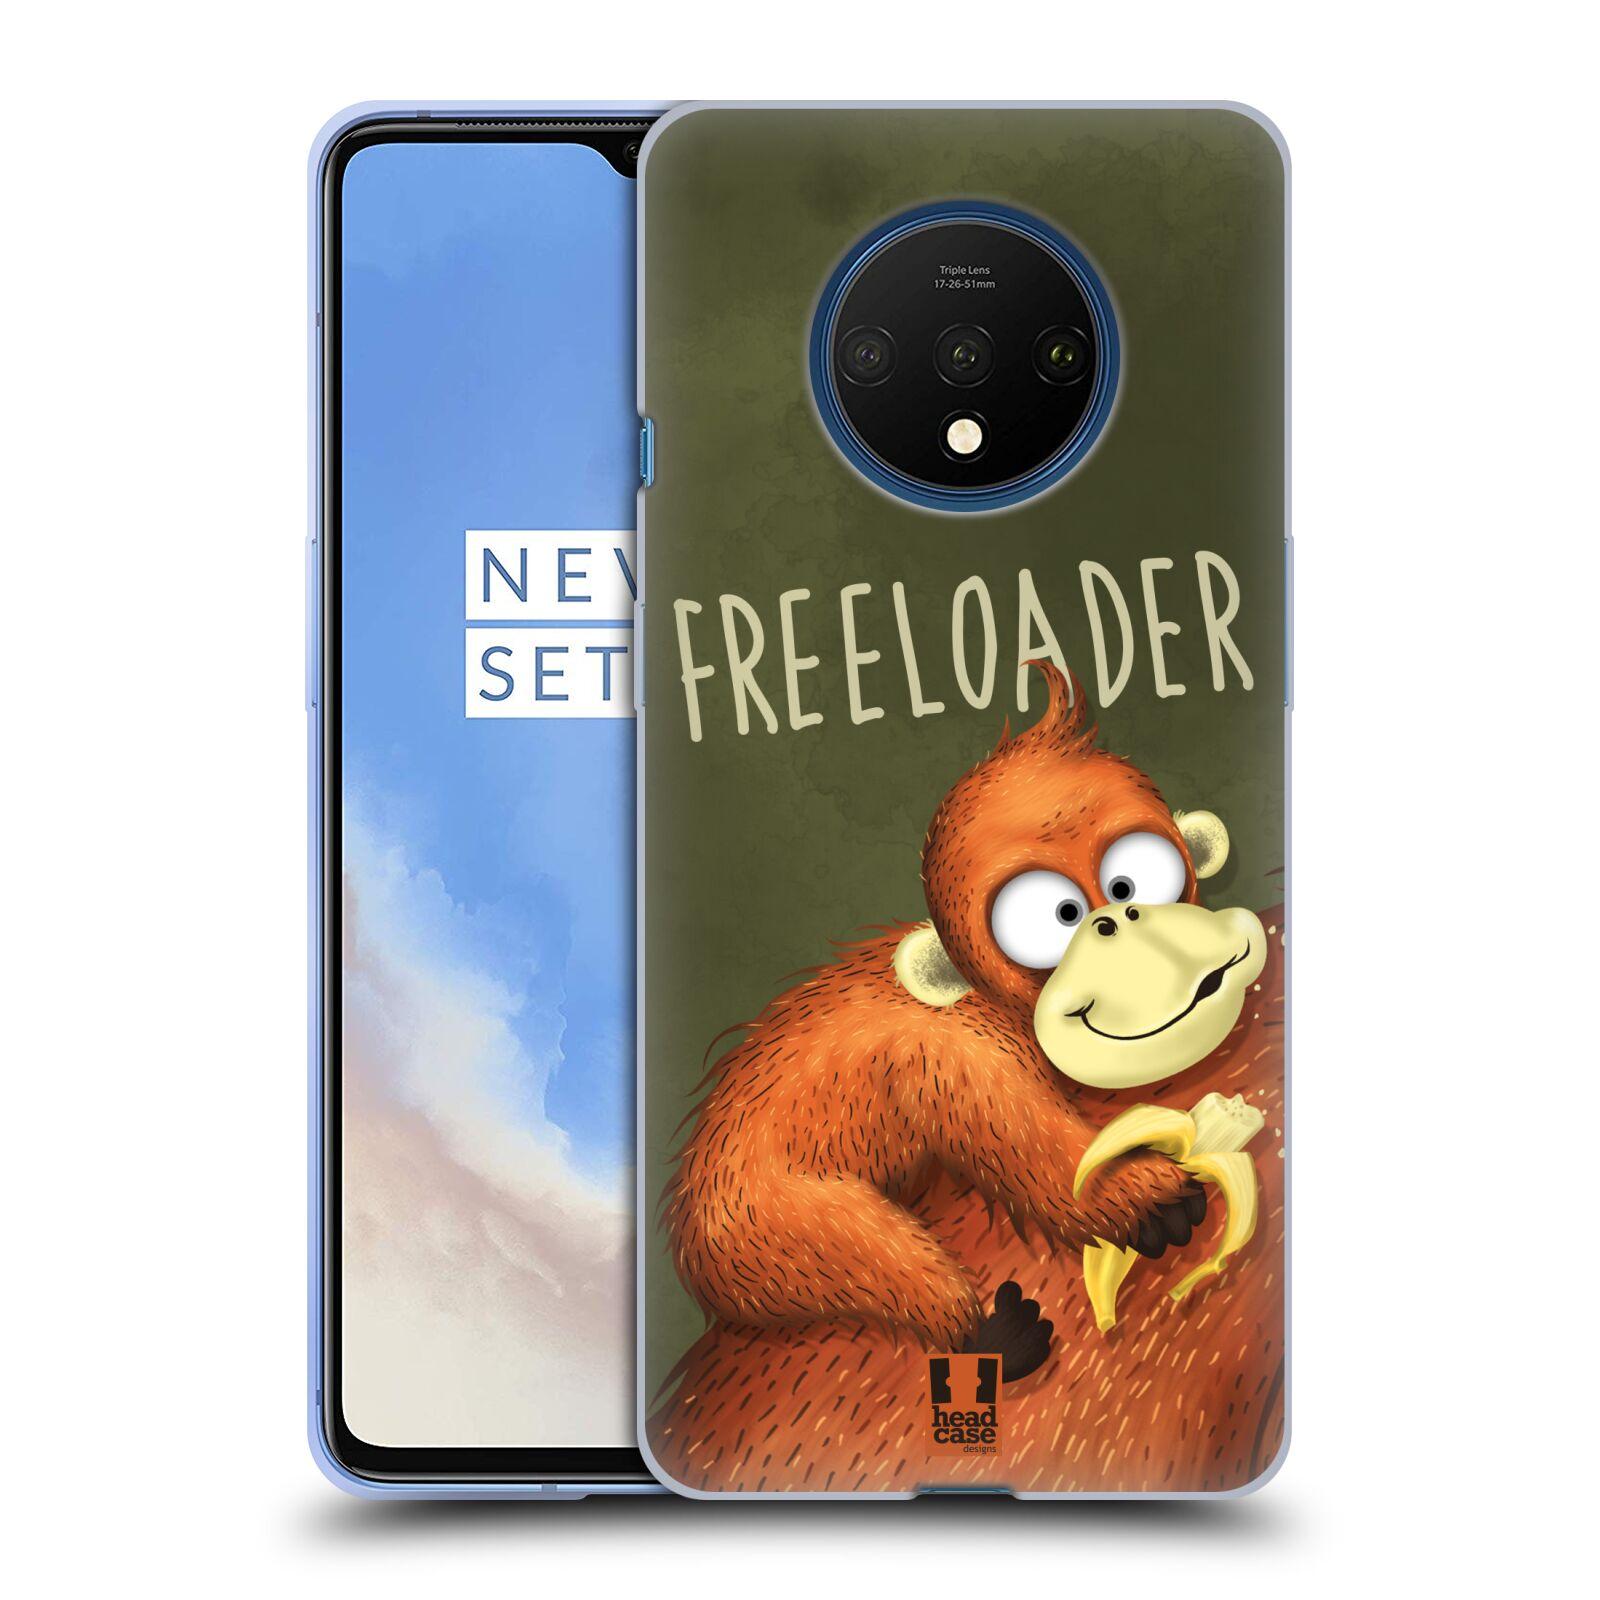 Silikonové pouzdro na mobil OnePlus 7T - Head Case - Opičák Freeloader